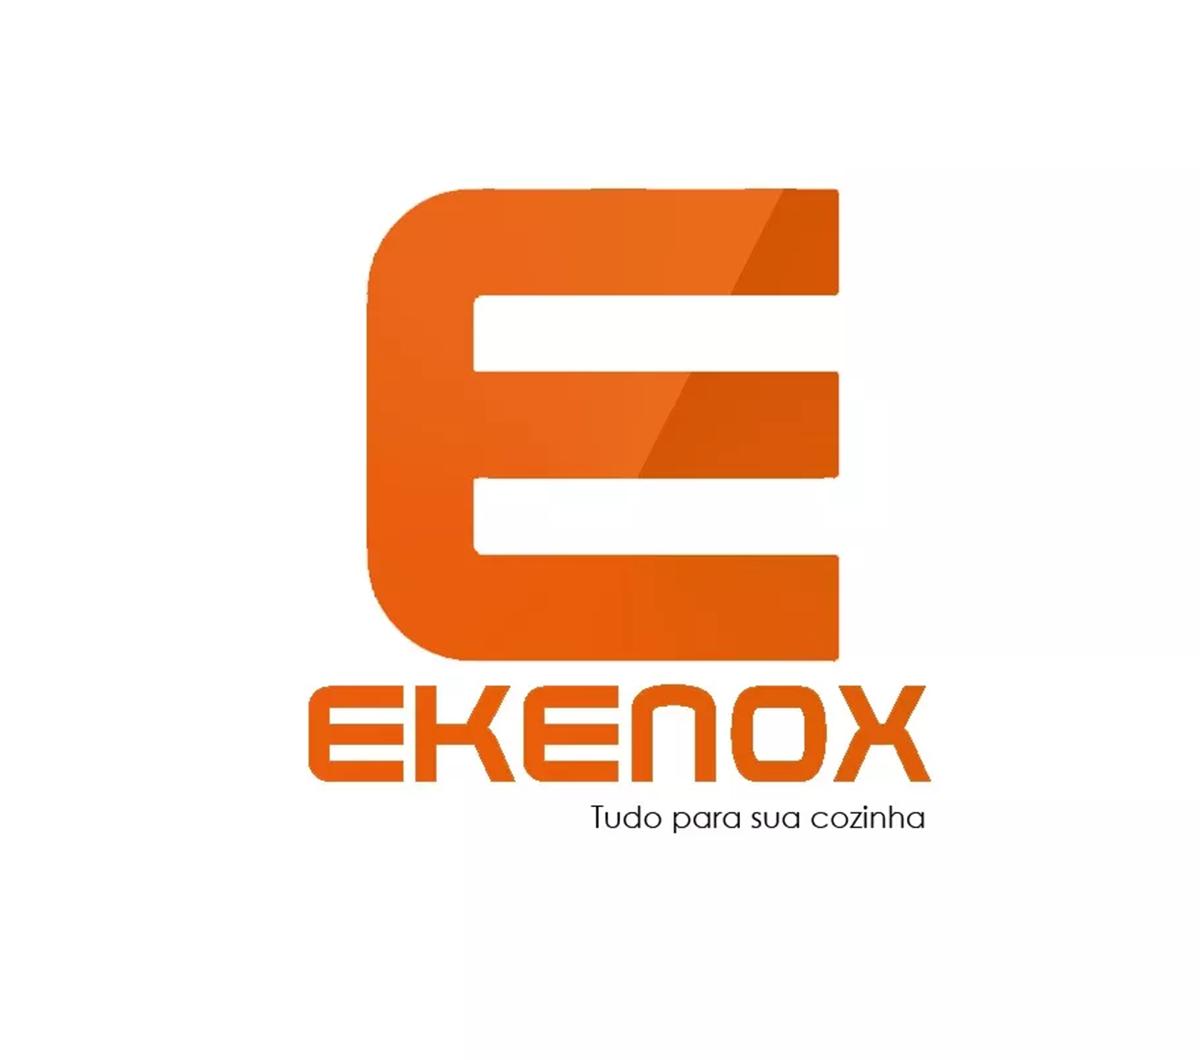 Chapa De Lanche 80X40 Cm 3 Queimadores Red Goumert   - EKENOX- Equipamentos Industriais